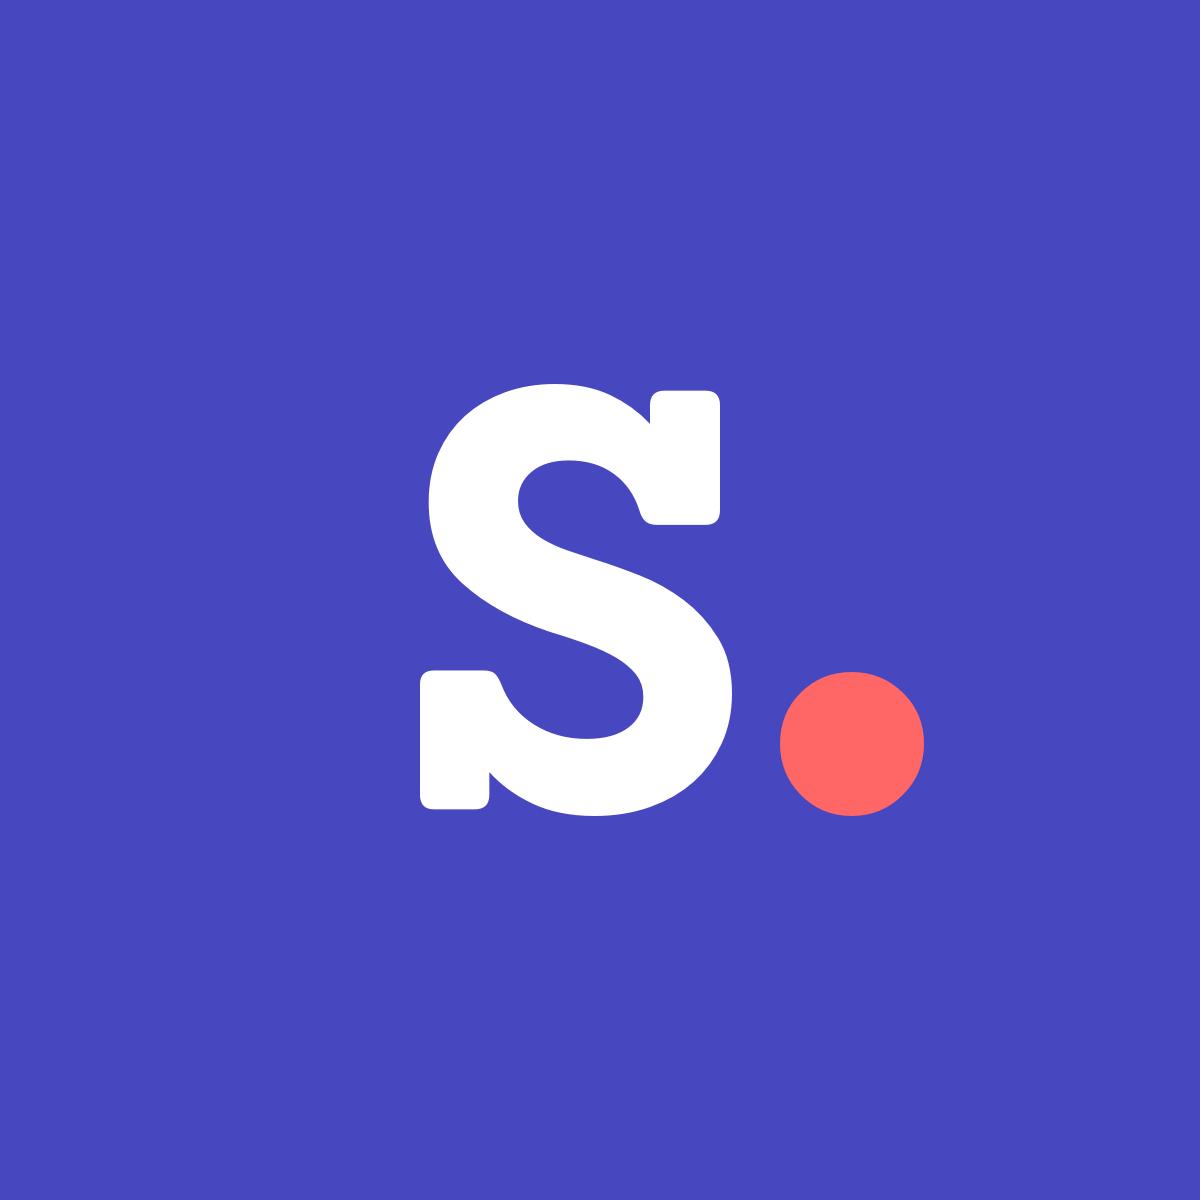 Speck Logo